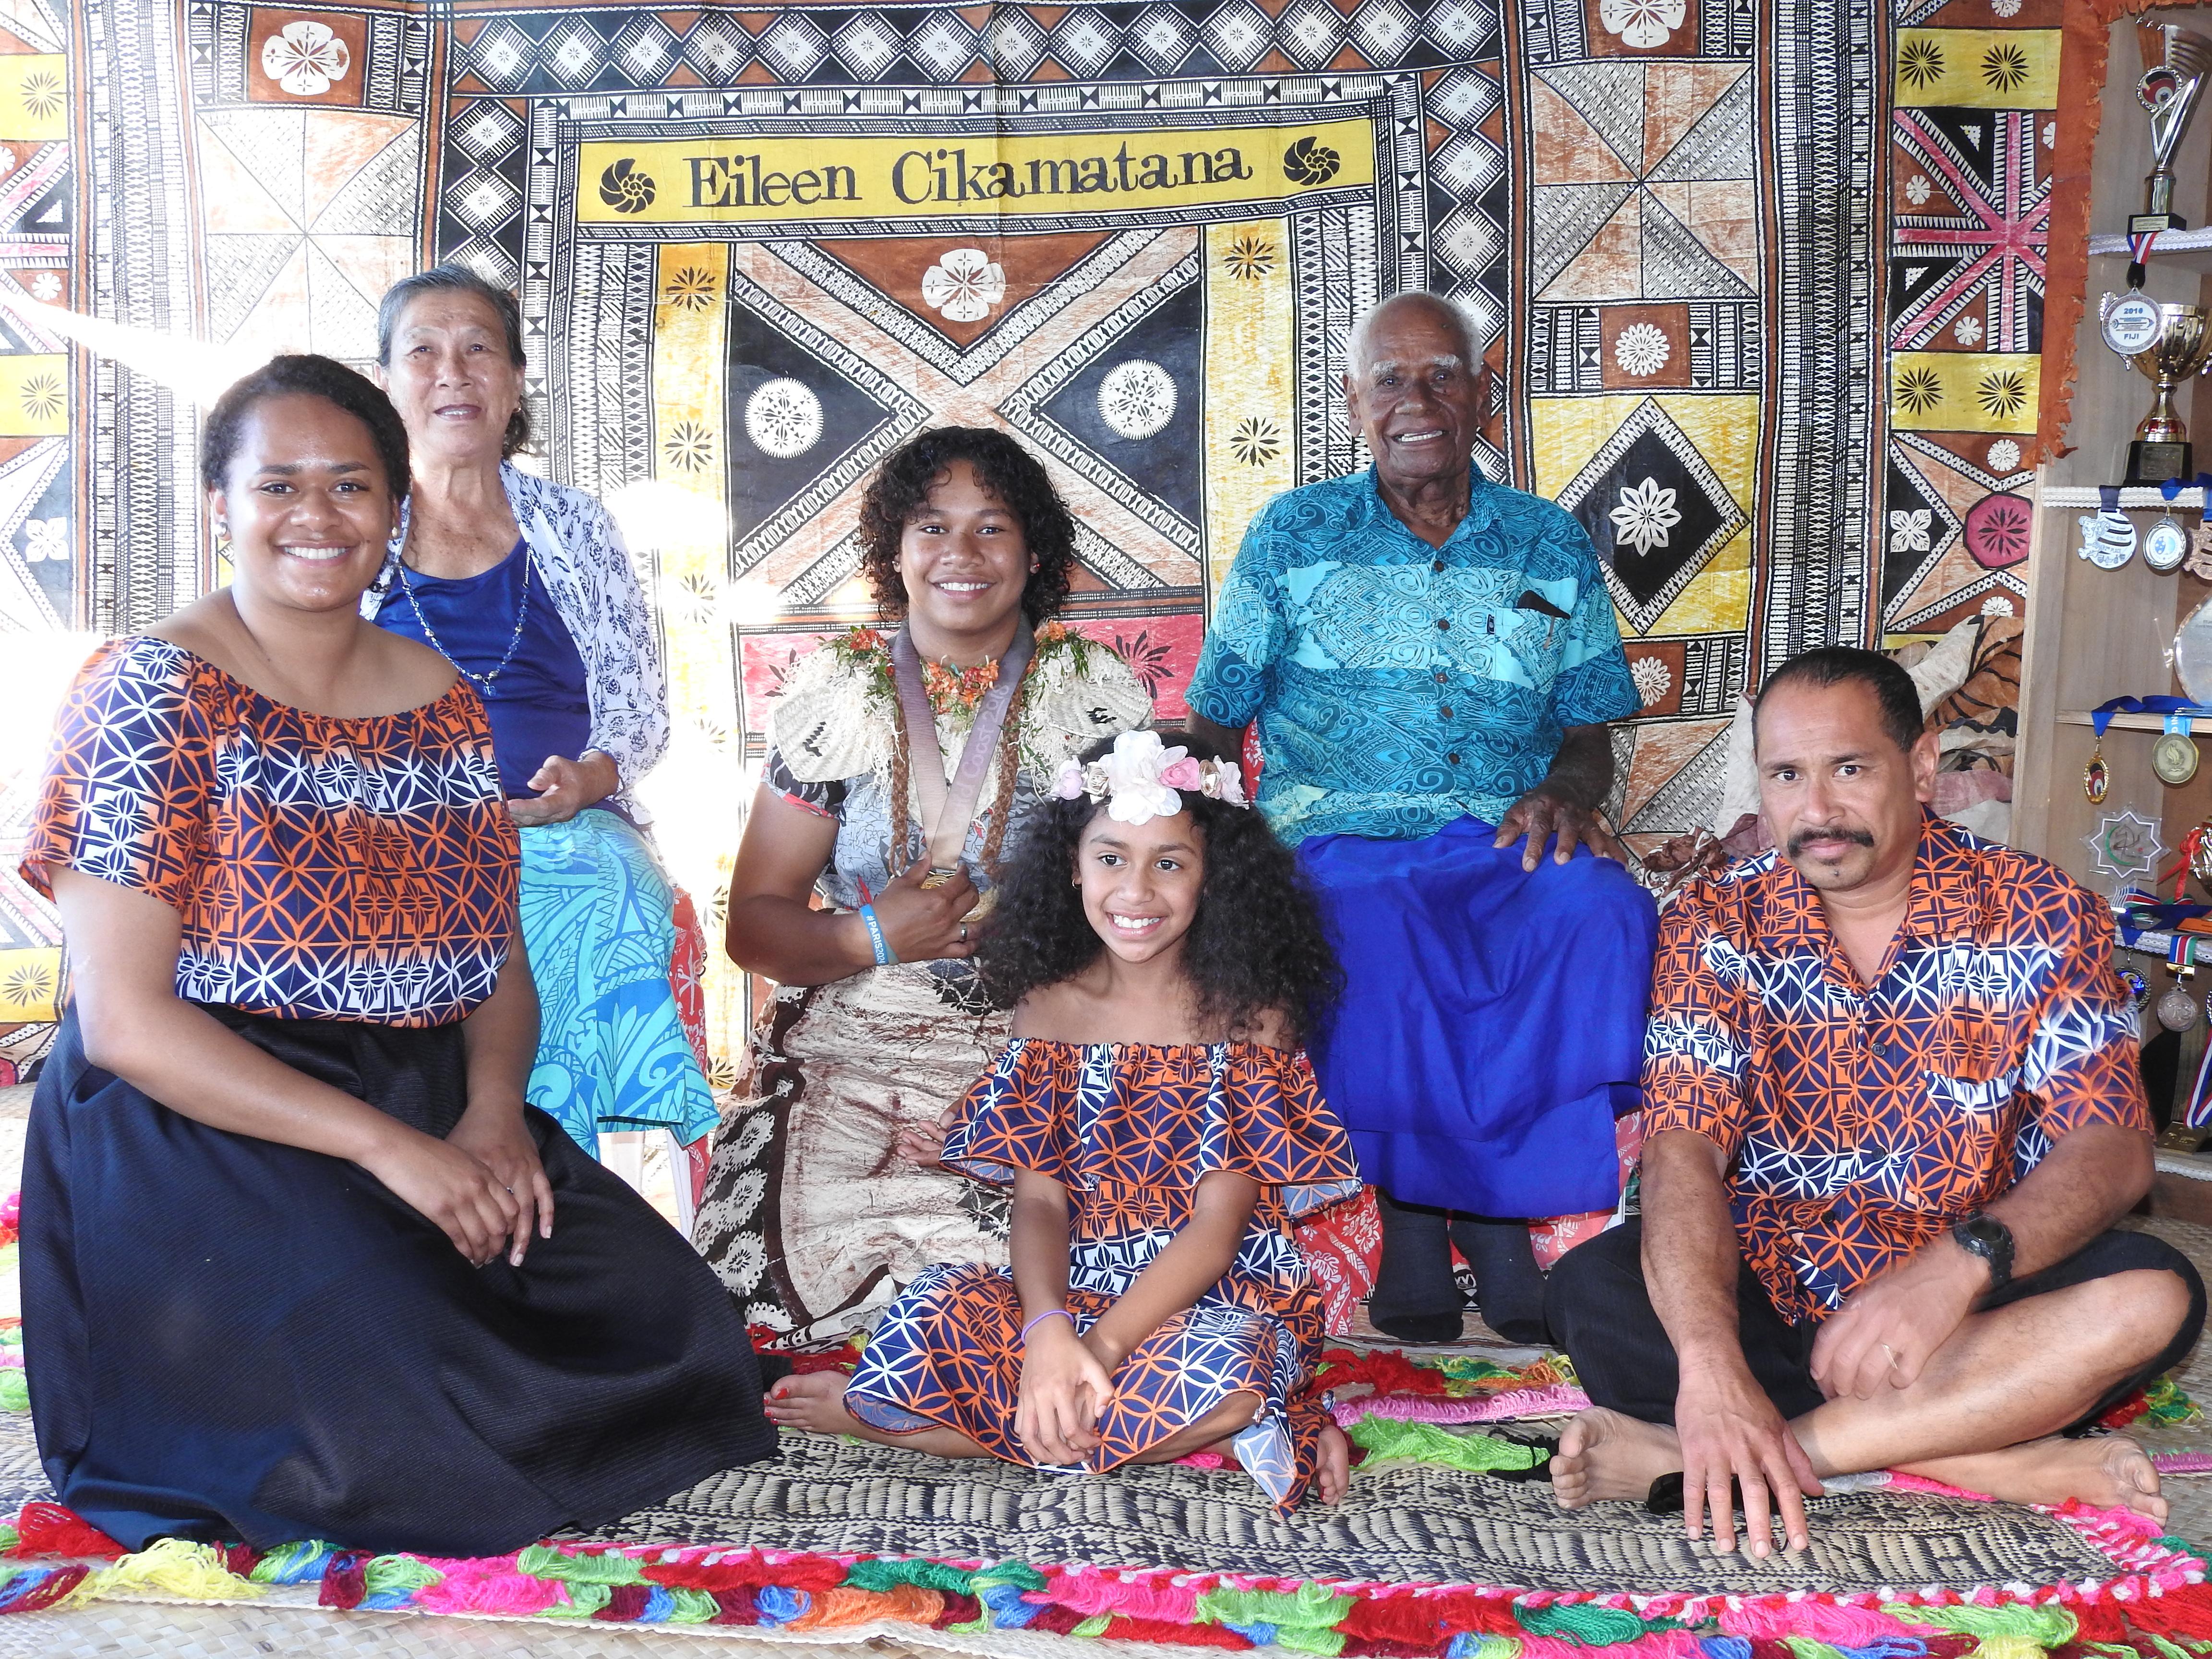 Eileen Cikamatana's family came from New Zealand to attend the celebration in Taviya Village, Ovalau on April 28, 2018. Photo: Manhar Lal